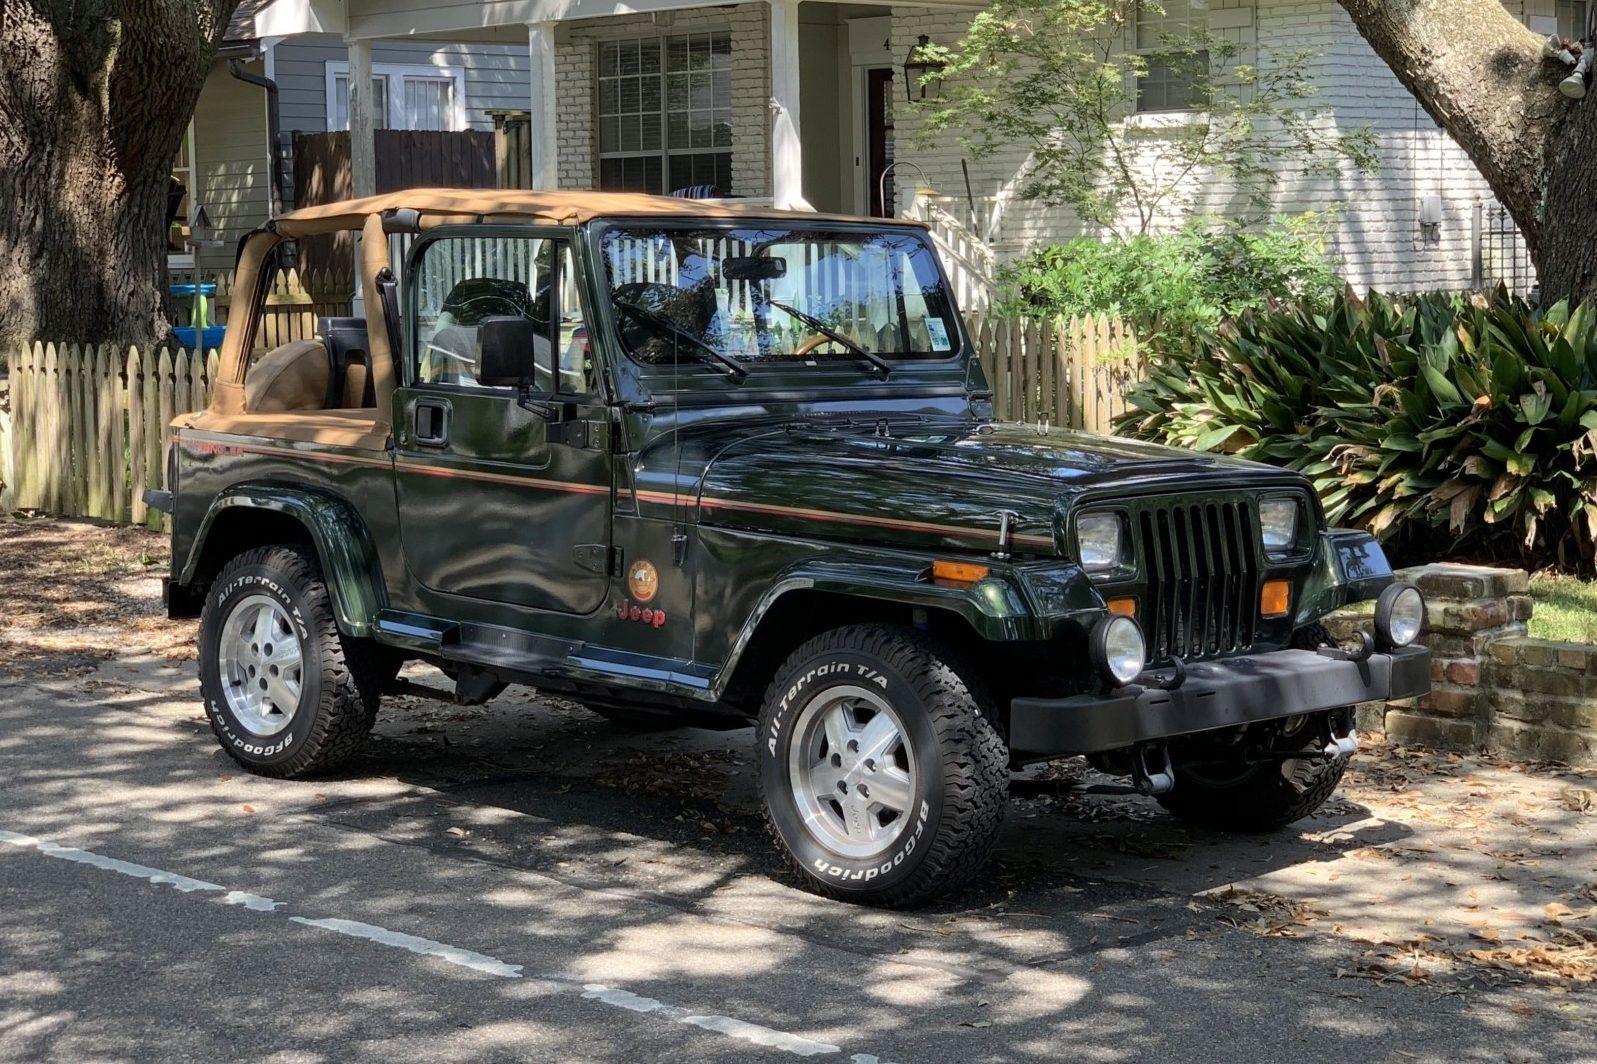 44kMile 1995 Jeep Wrangler Sahara Jeep wrangler